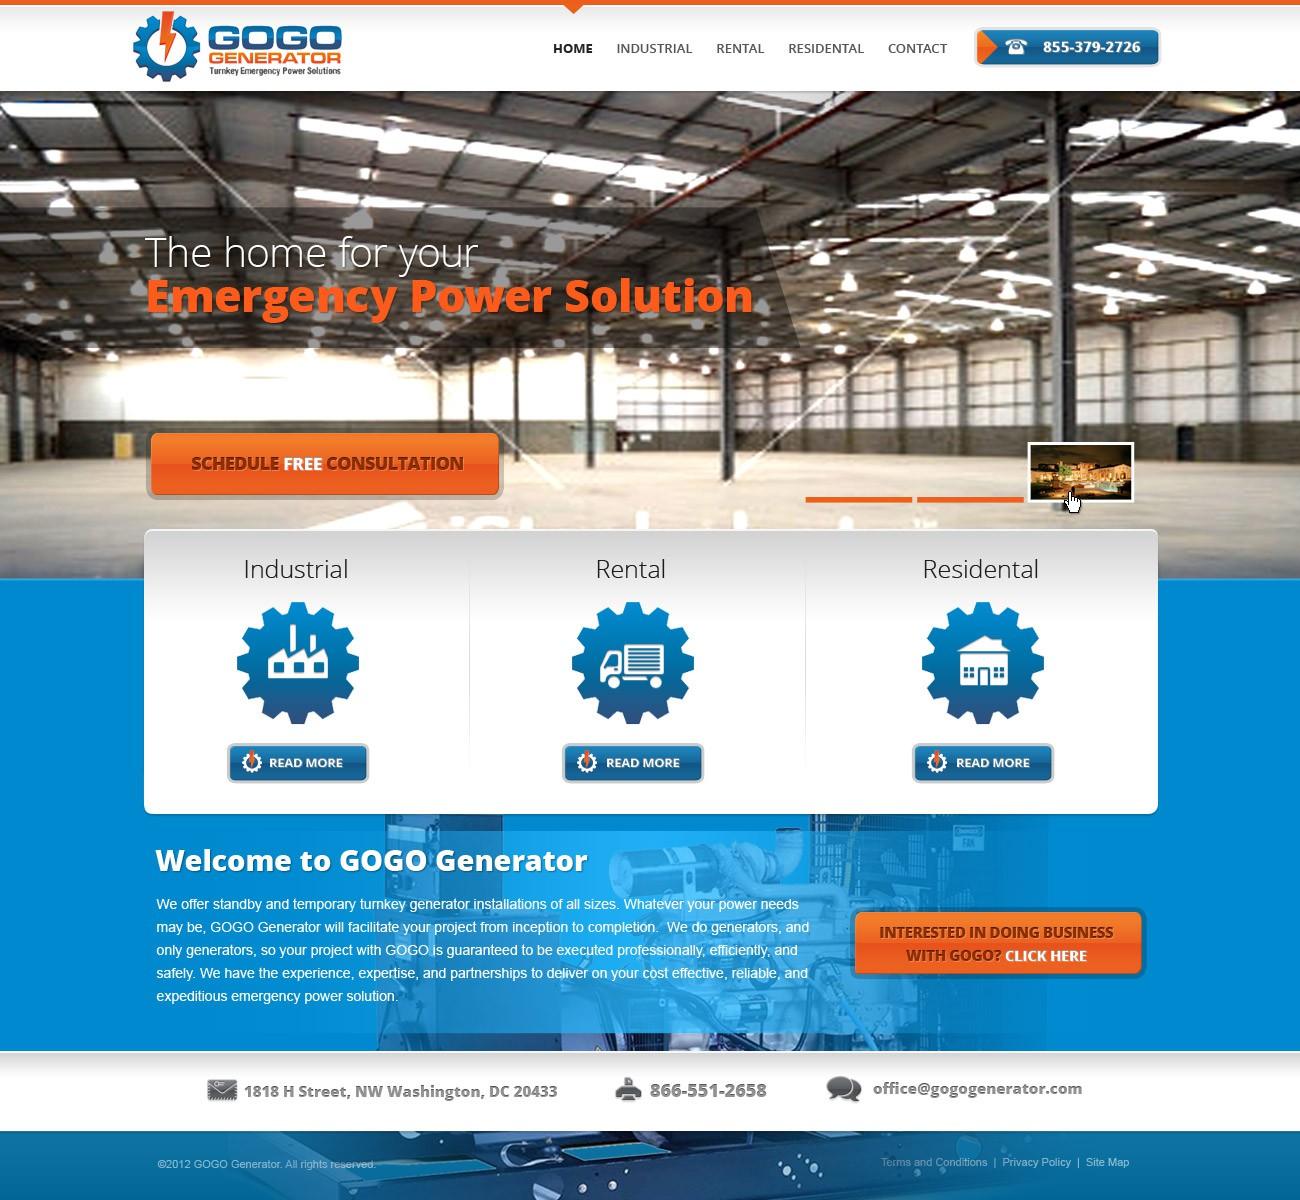 GOGO Generator, LLC needs a new website design